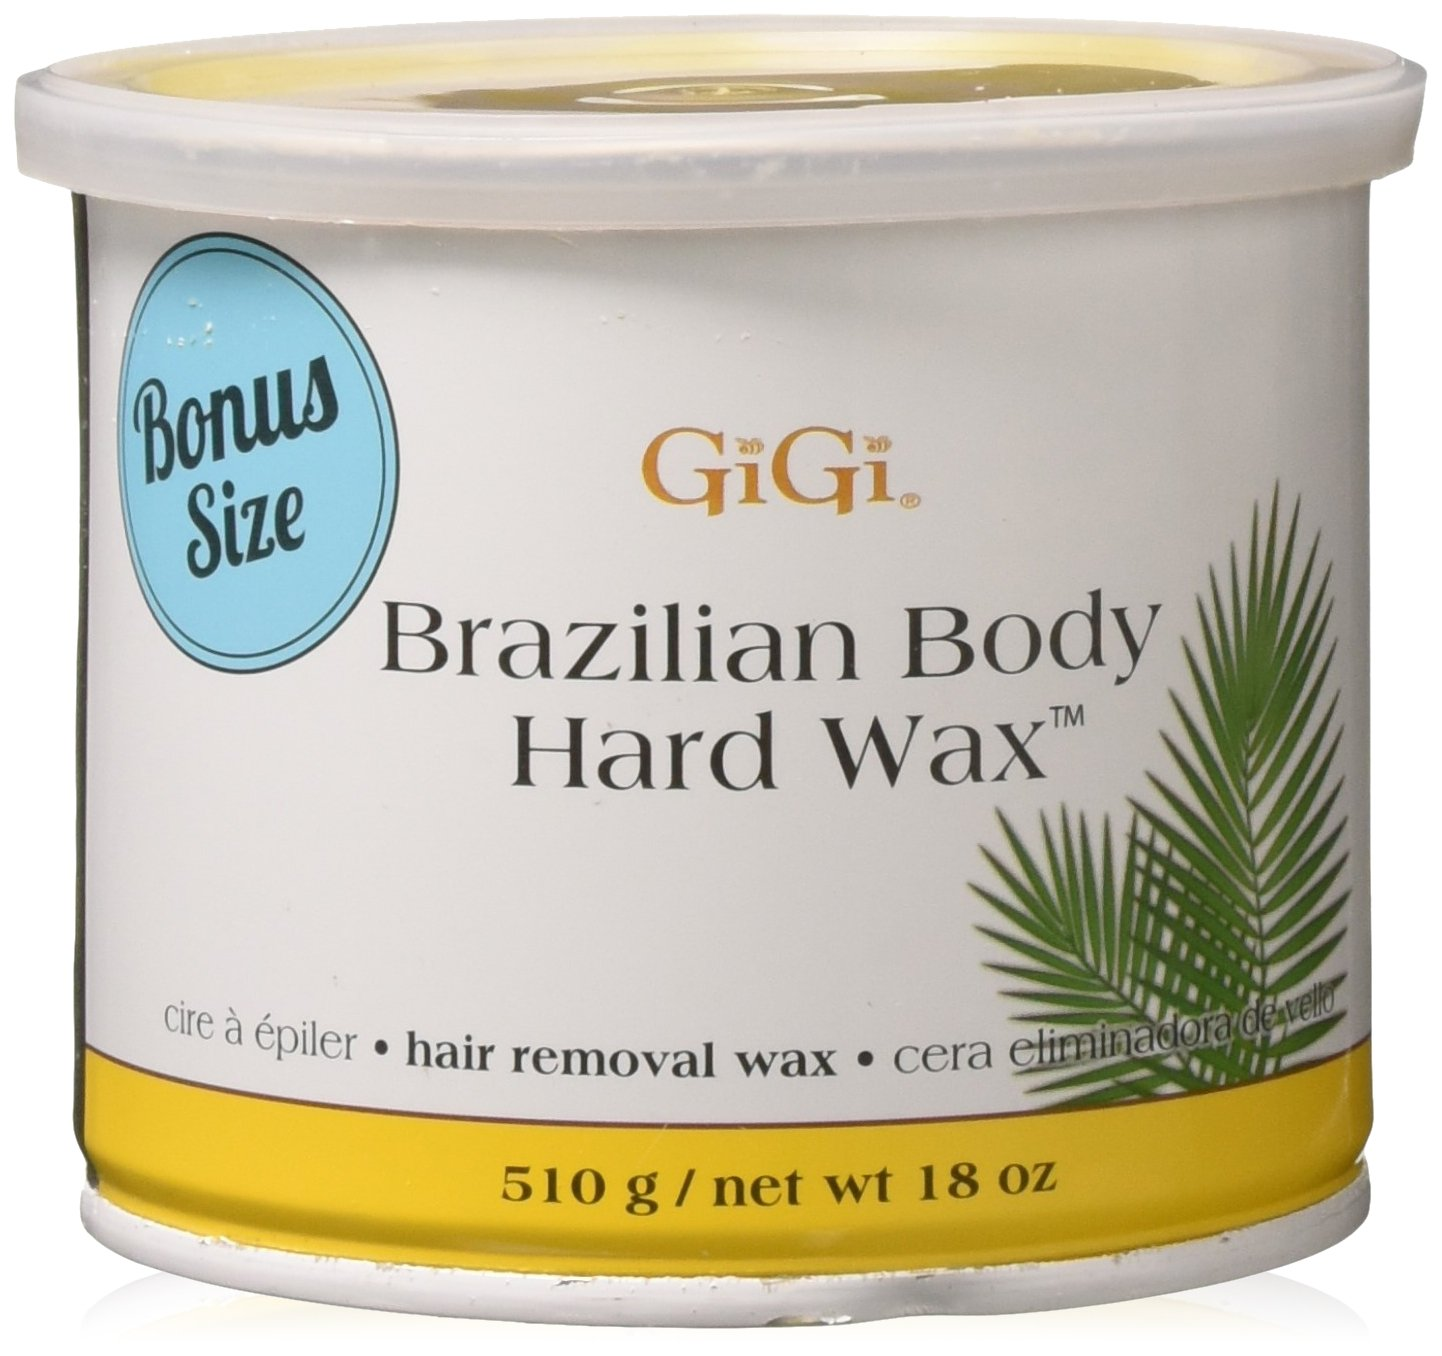 GiGi Brazilian Body Hard Wax 18 ounce